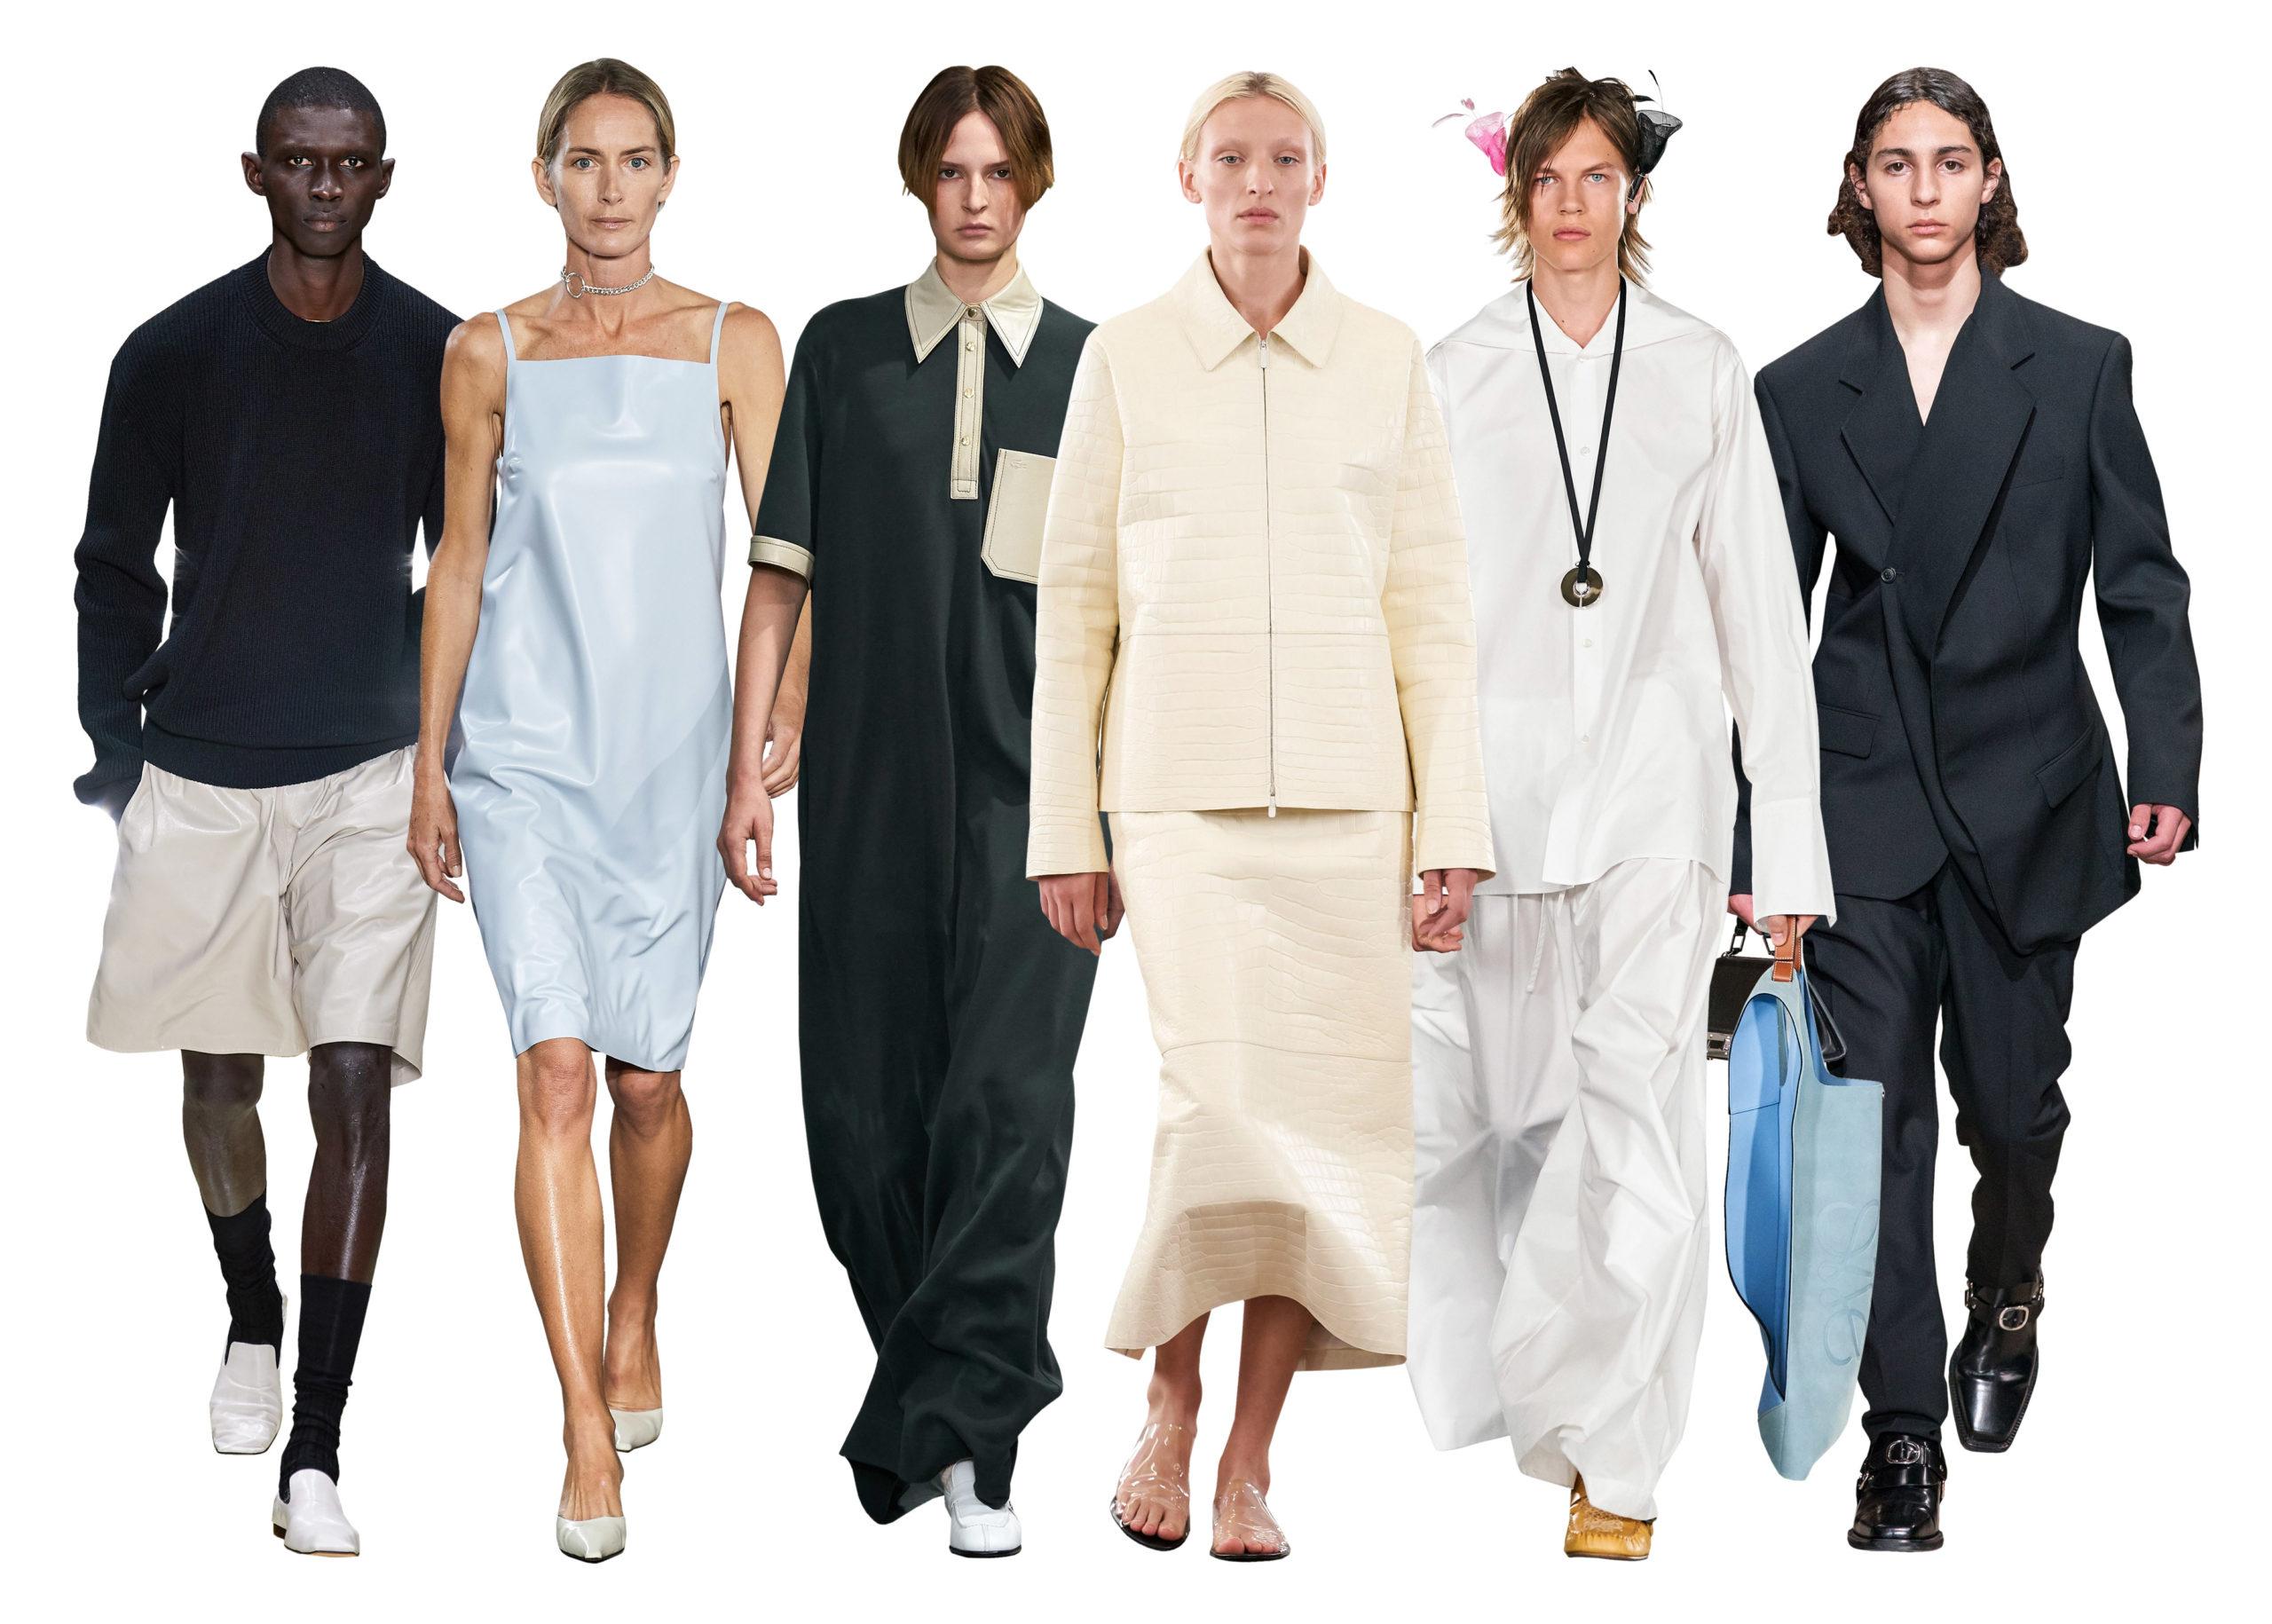 '90s minimalistic fashion, runway models